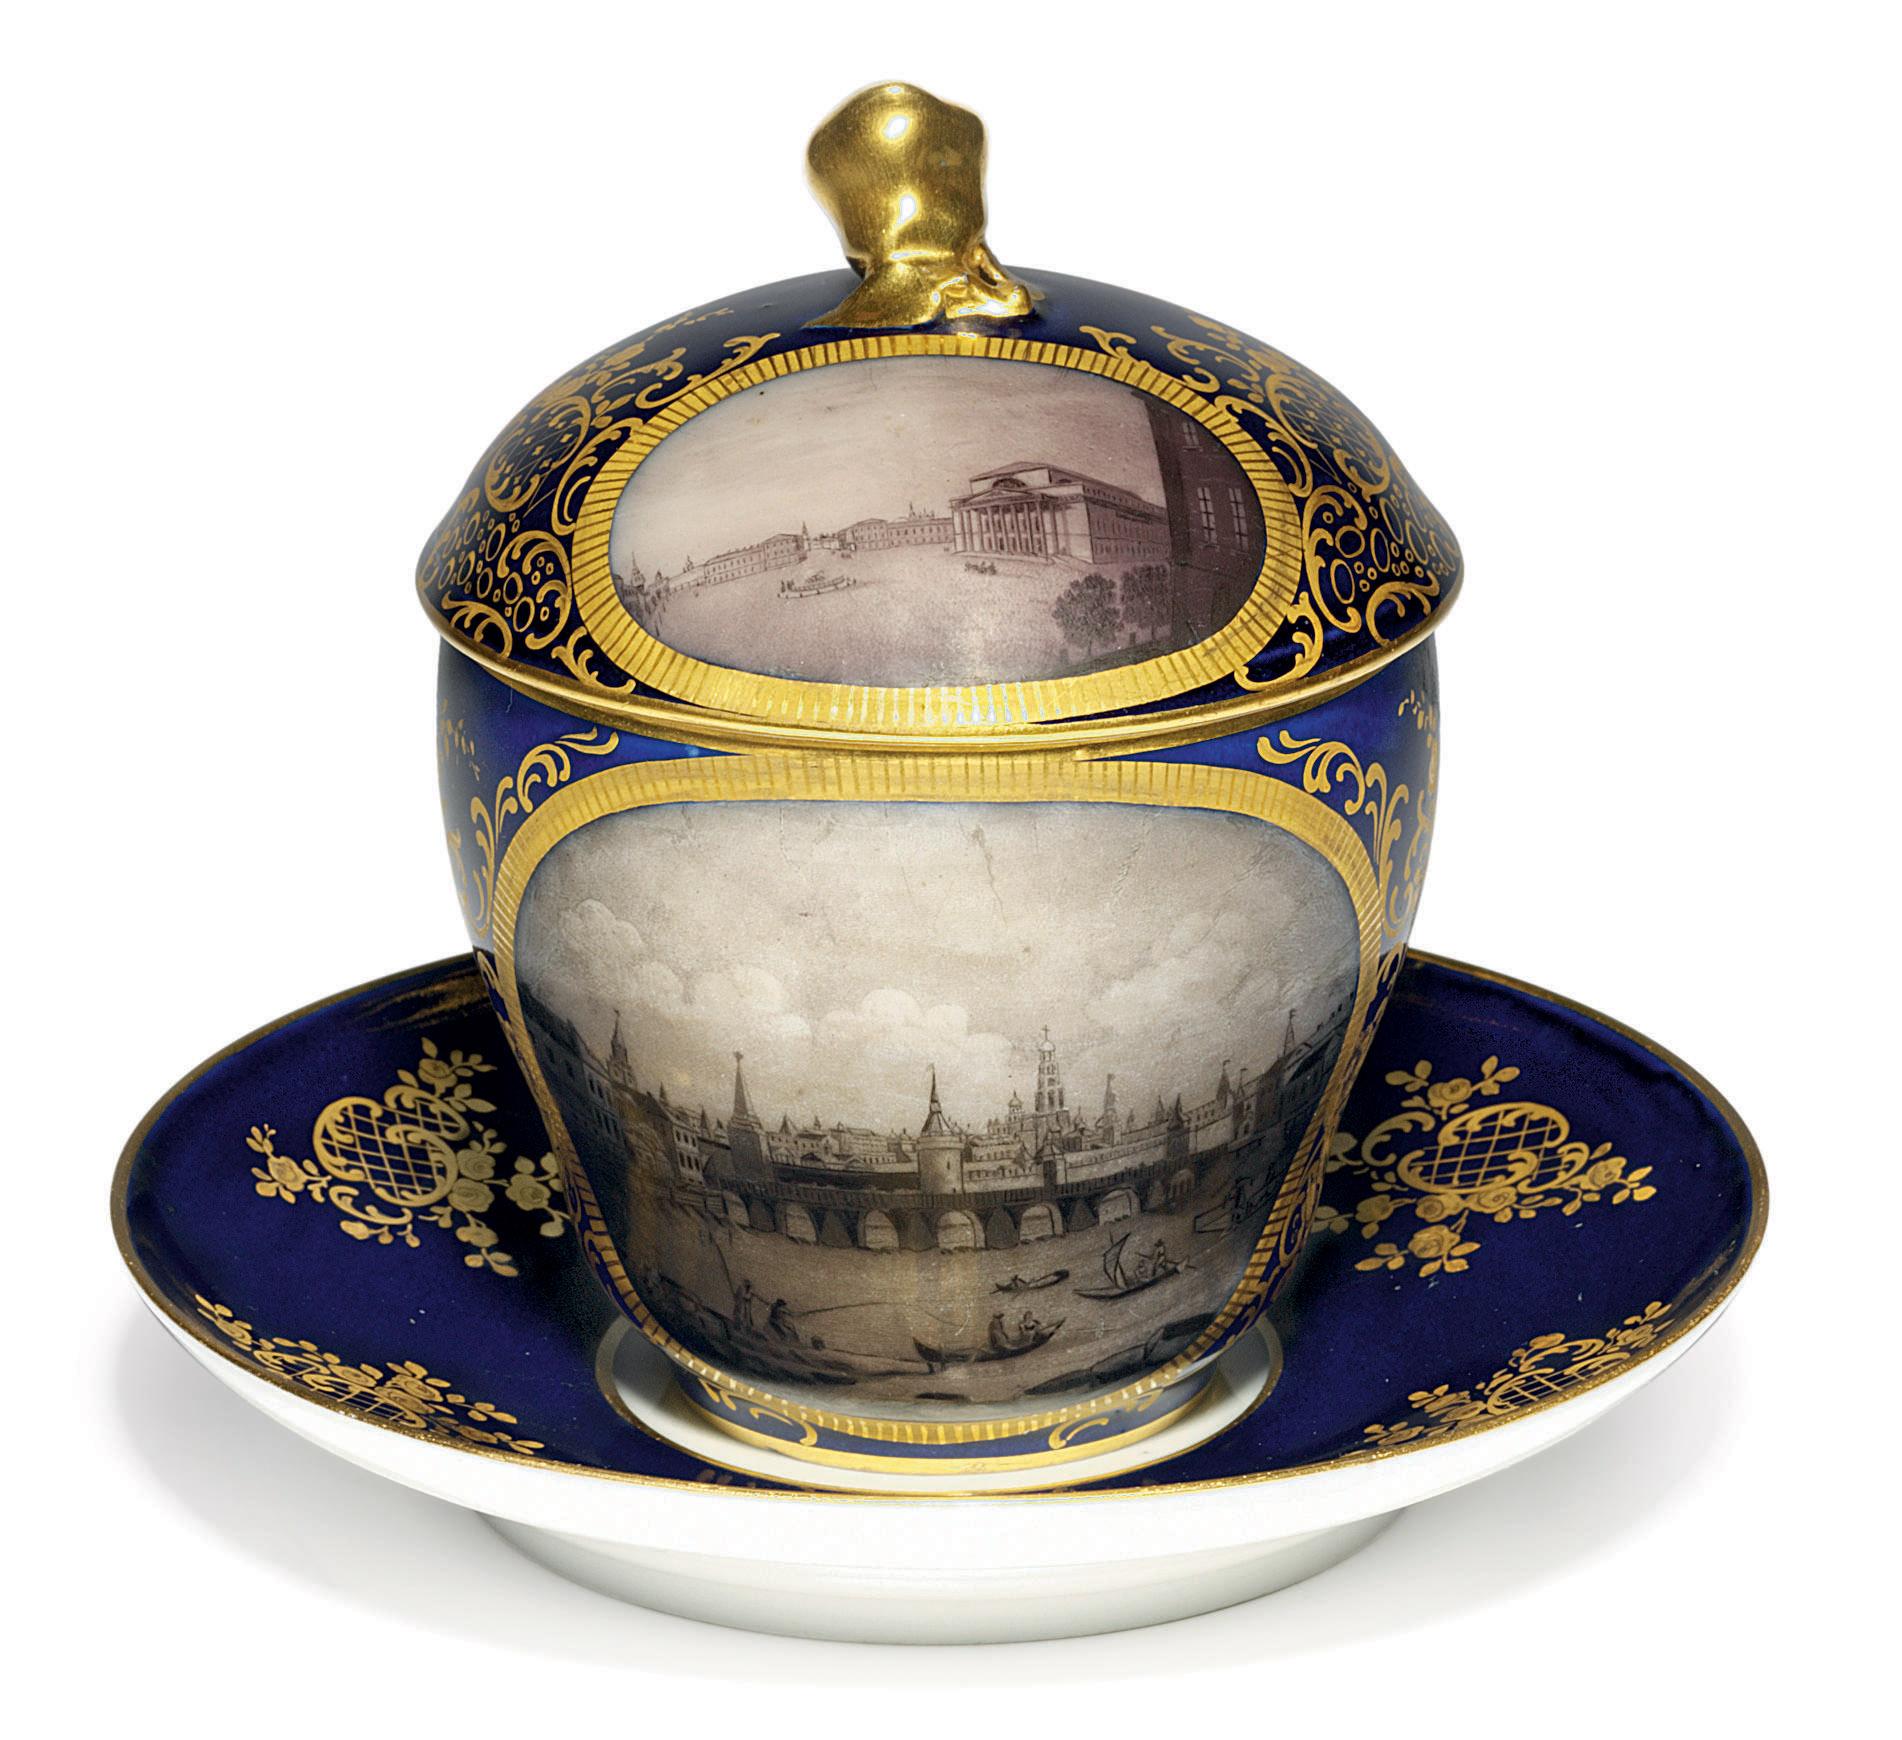 A Porcelain Presentation Cup And Saucer